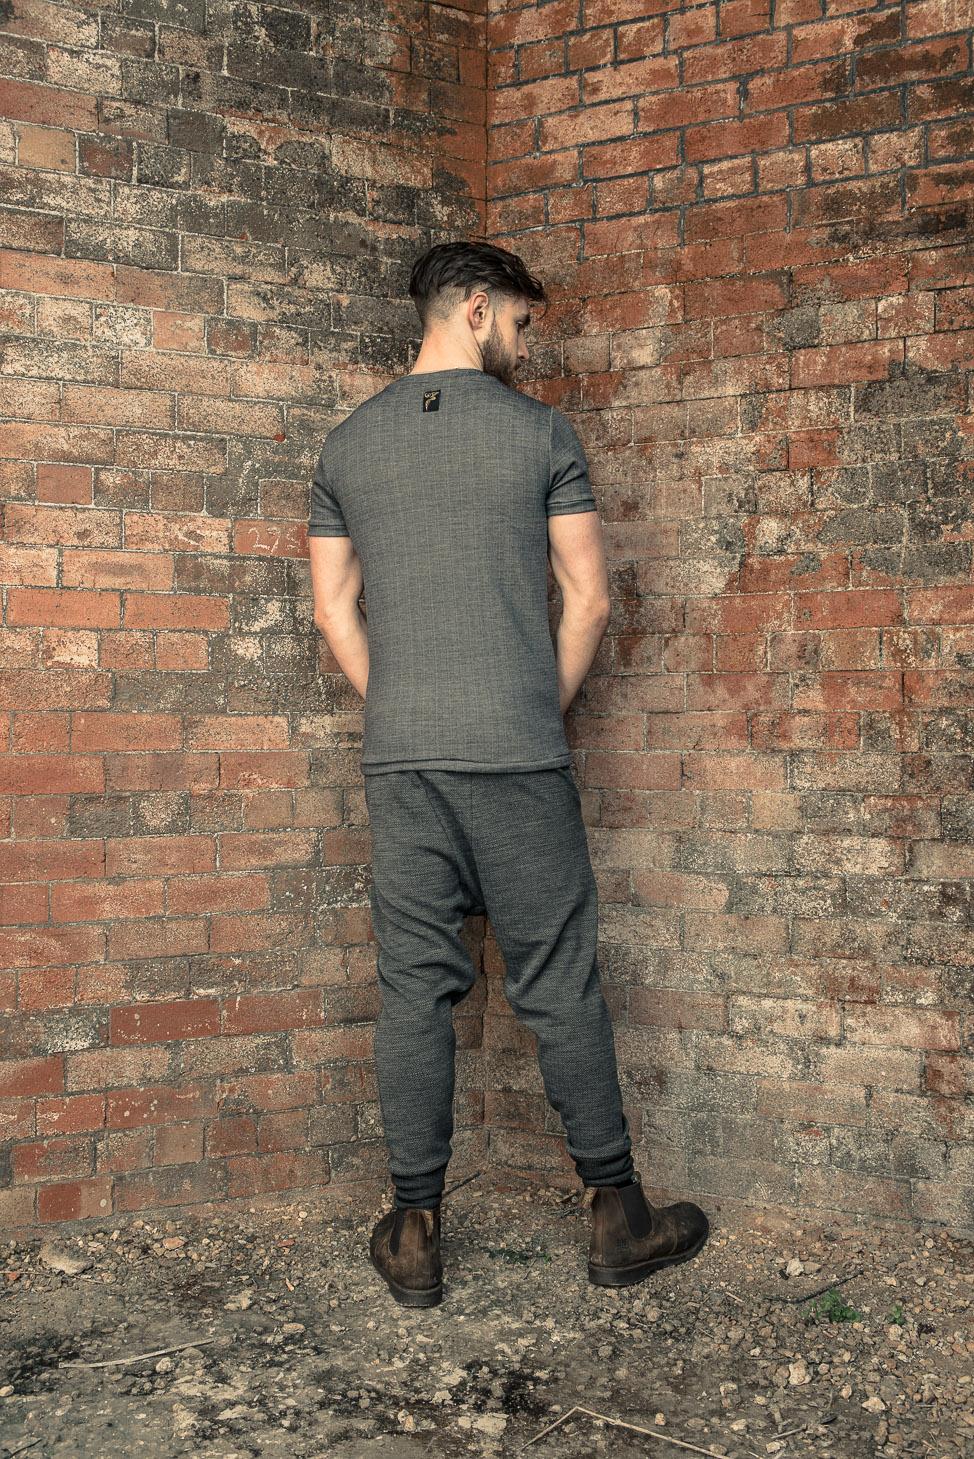 zaramia-ava-zaramiaava-leeds-fashion-designer-ethical-sustainable-tailored-minimalist-fitted-versatile-drape-koji-grey-tshirt-top-hareem-trousers-black-grey-texture-styling-menswear-model-19